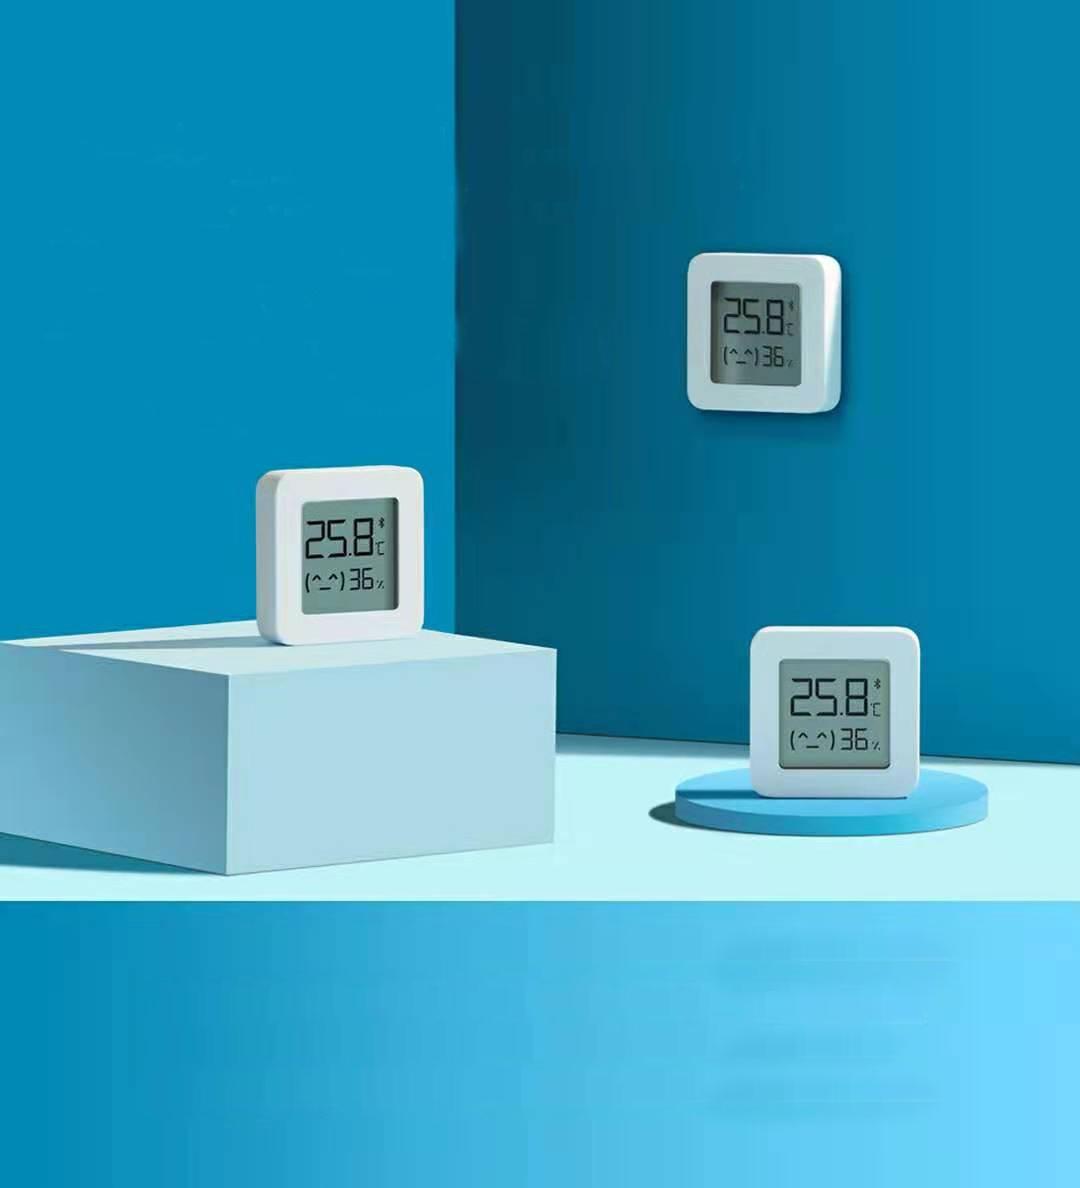 Lot de 3 Capteurs de température et d'humidité Xiaomi Mijia V2 - Bluetooth